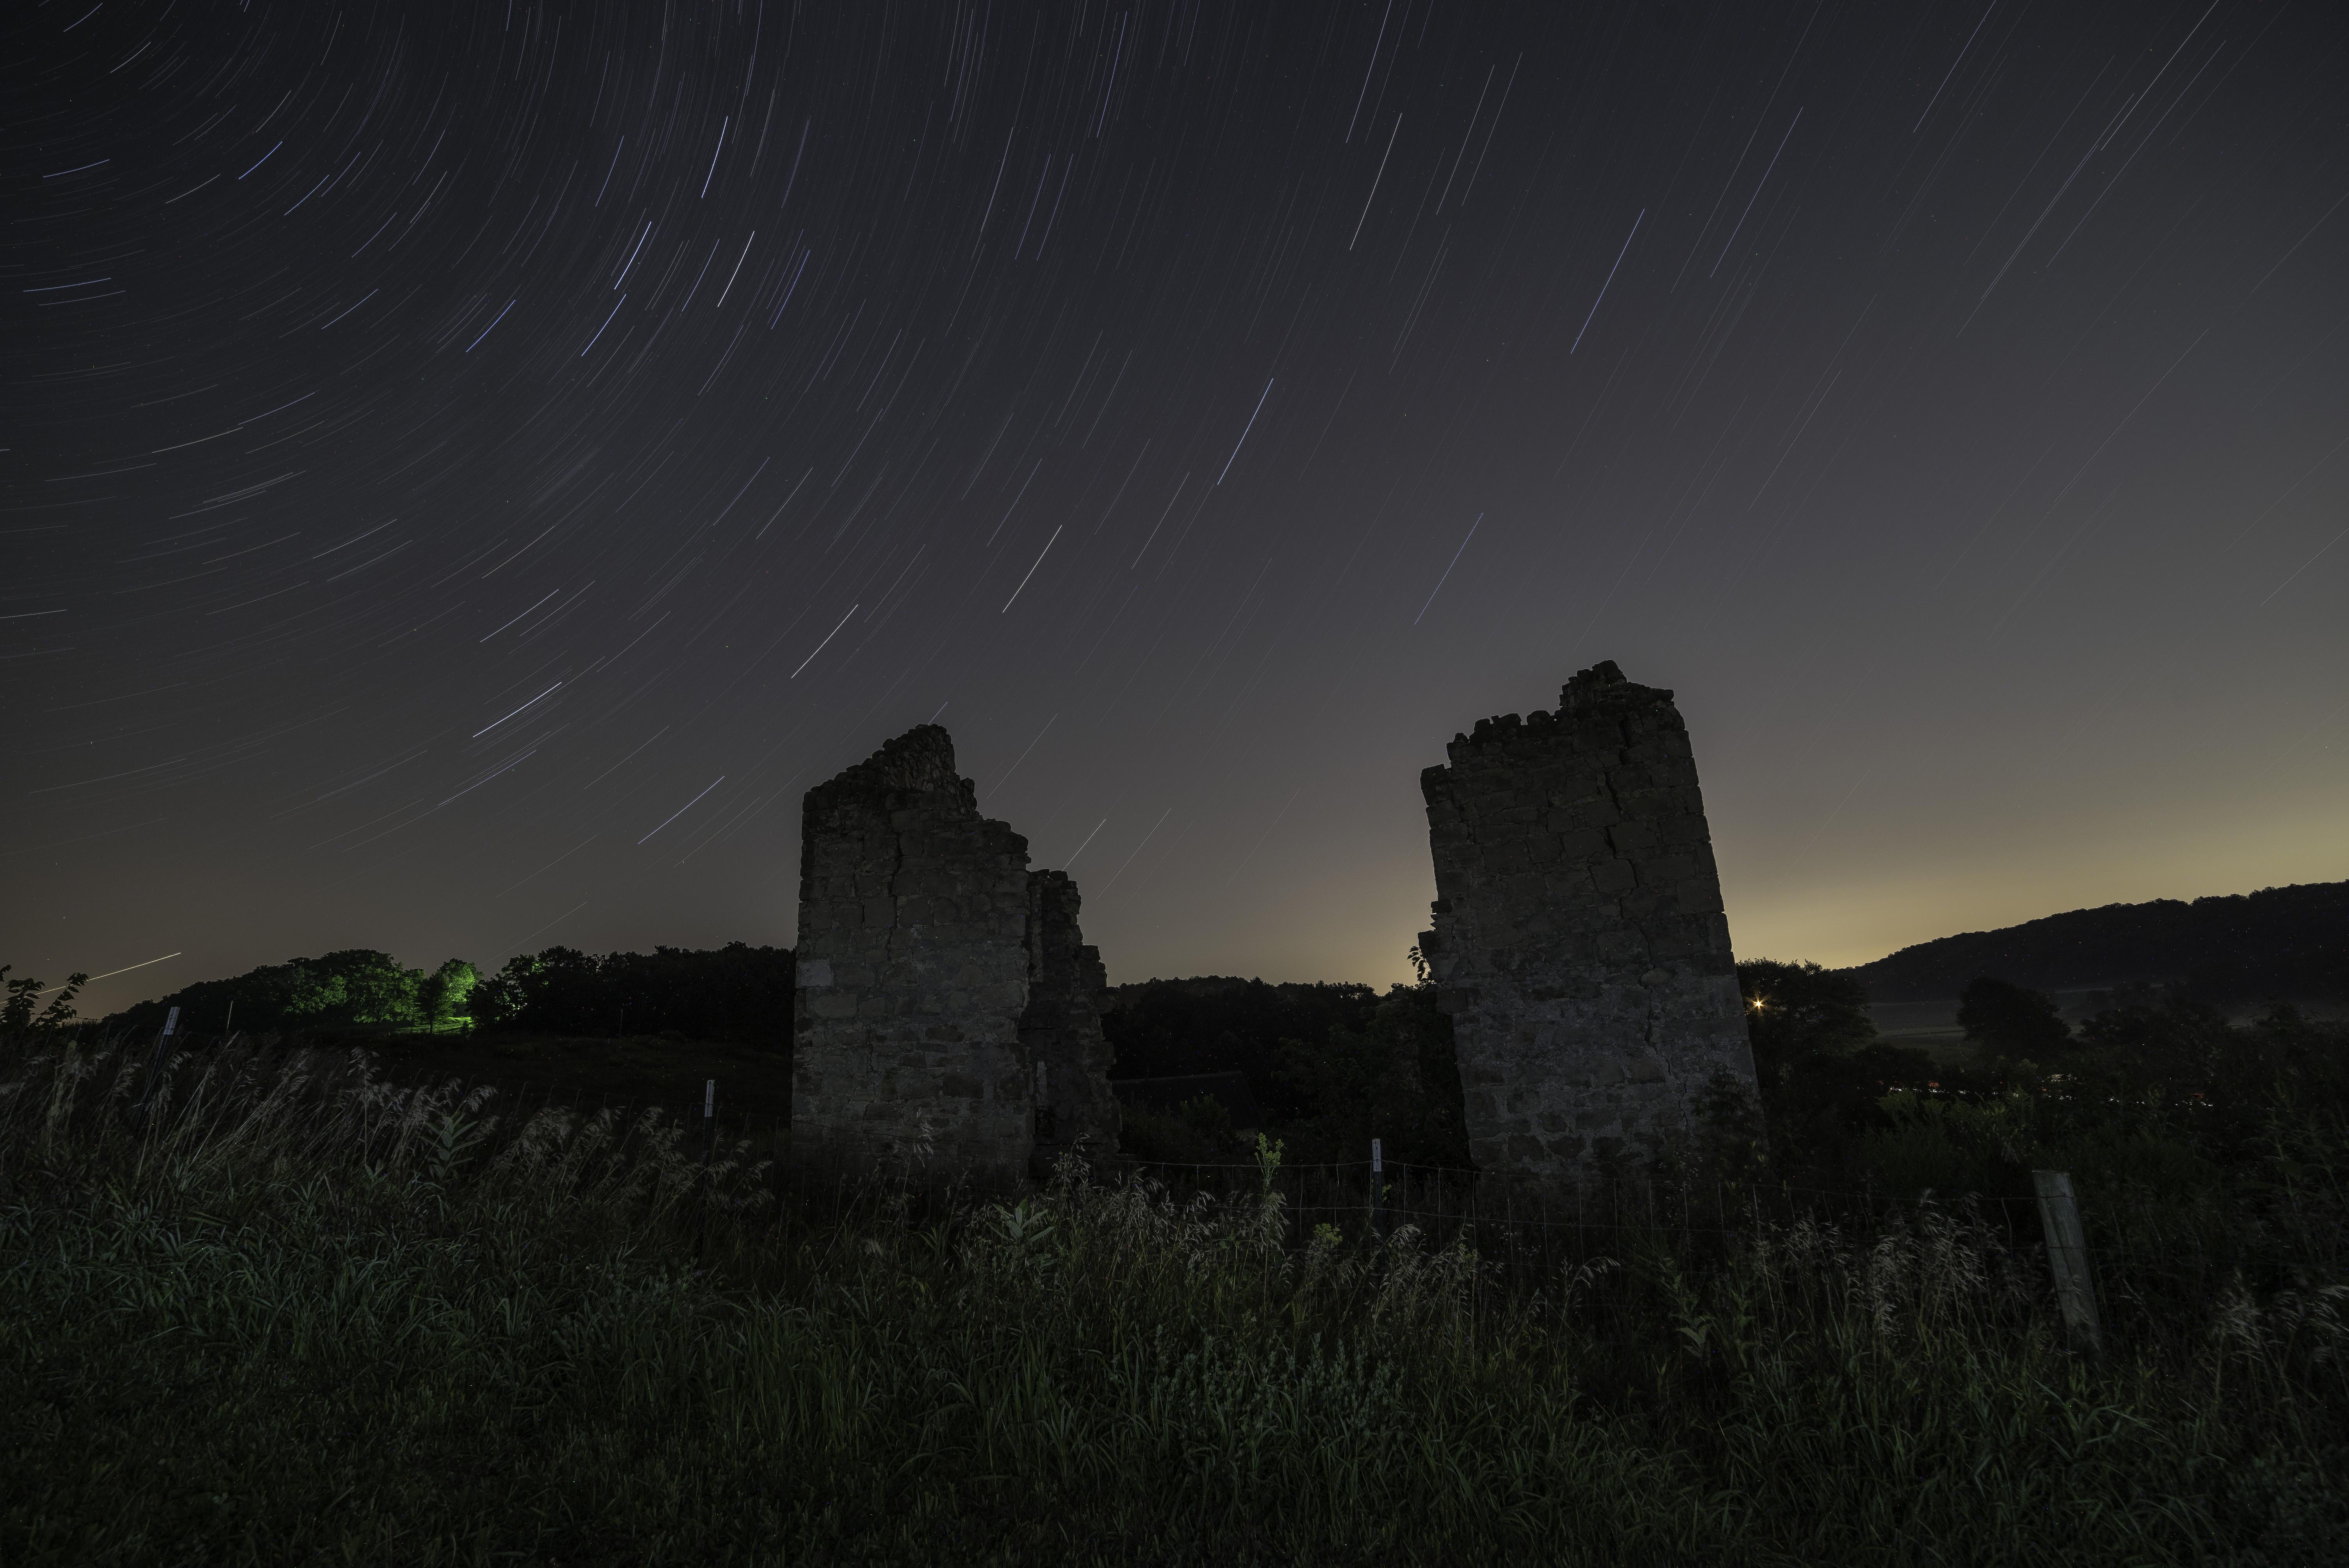 Star Trails over abandoned house image - Free stock photo - Public